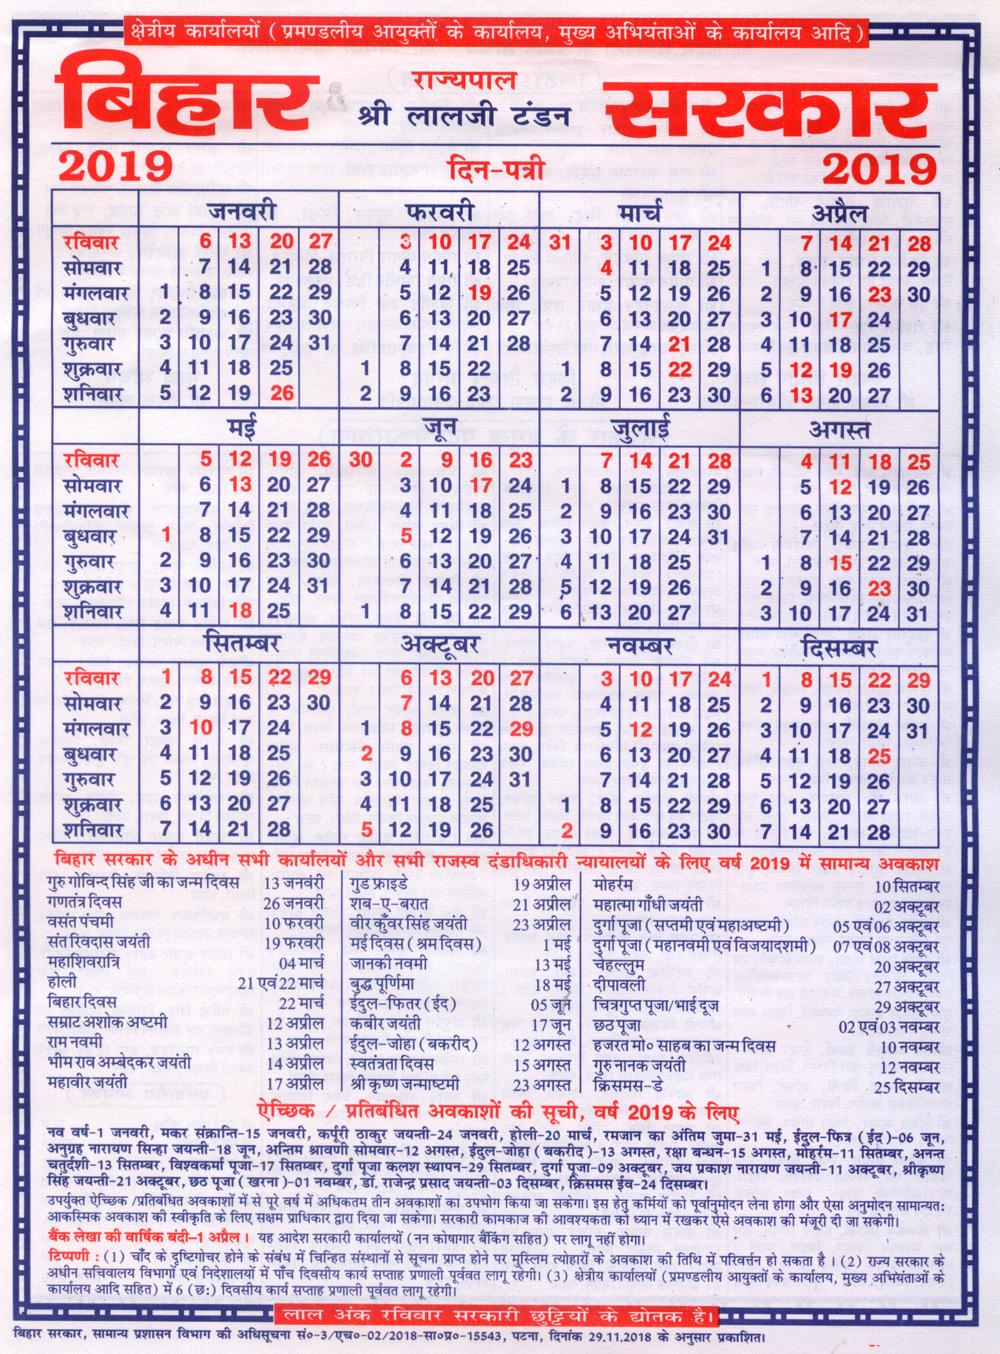 Download Bihar Sarkar Calendar 2020 | Calendar For Planning within Bihar Government Calender